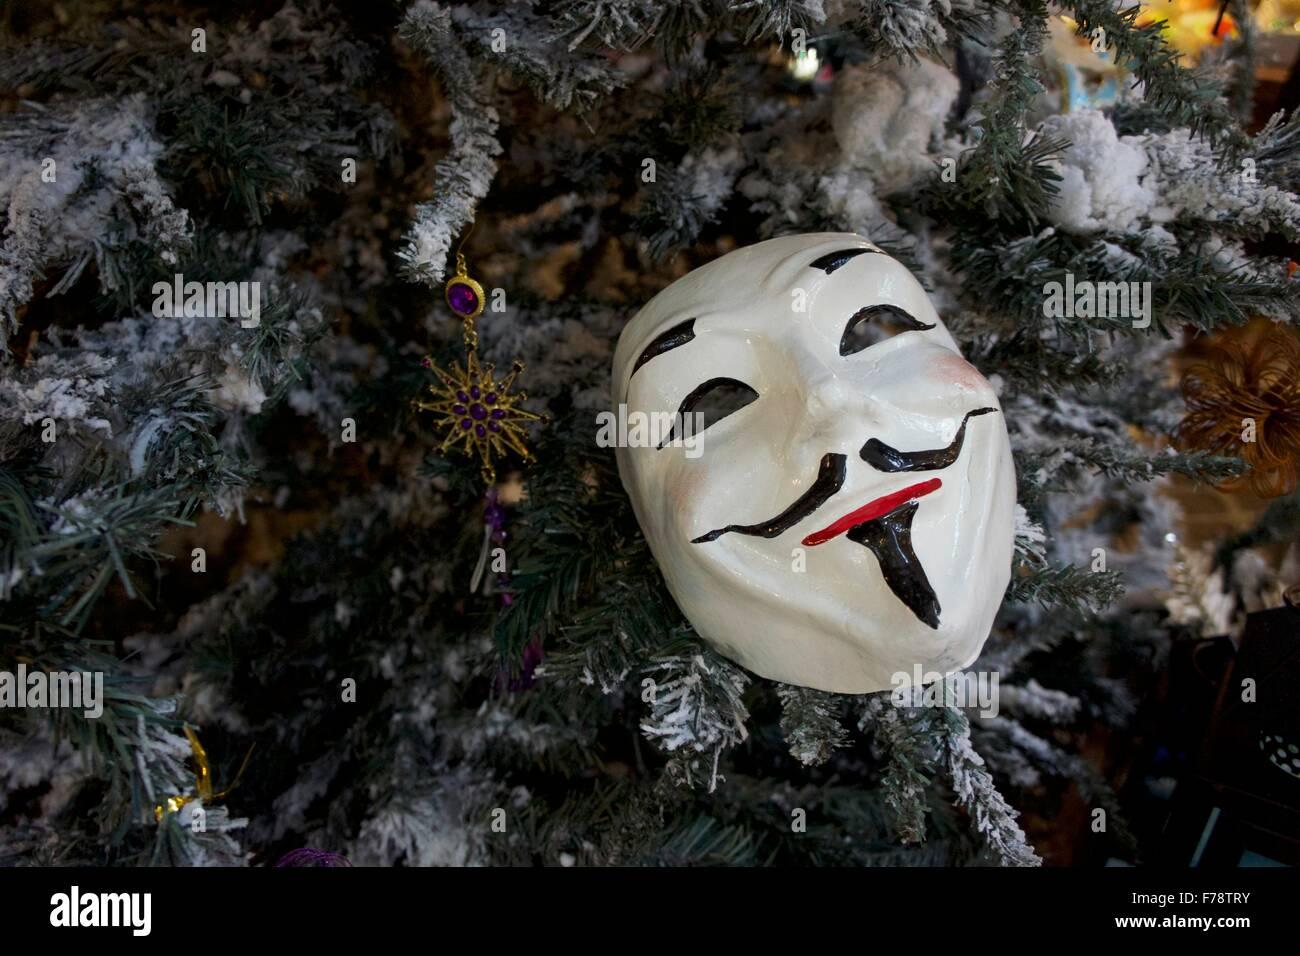 Theatrical mask decoration on Christmas Tree - Stock Image